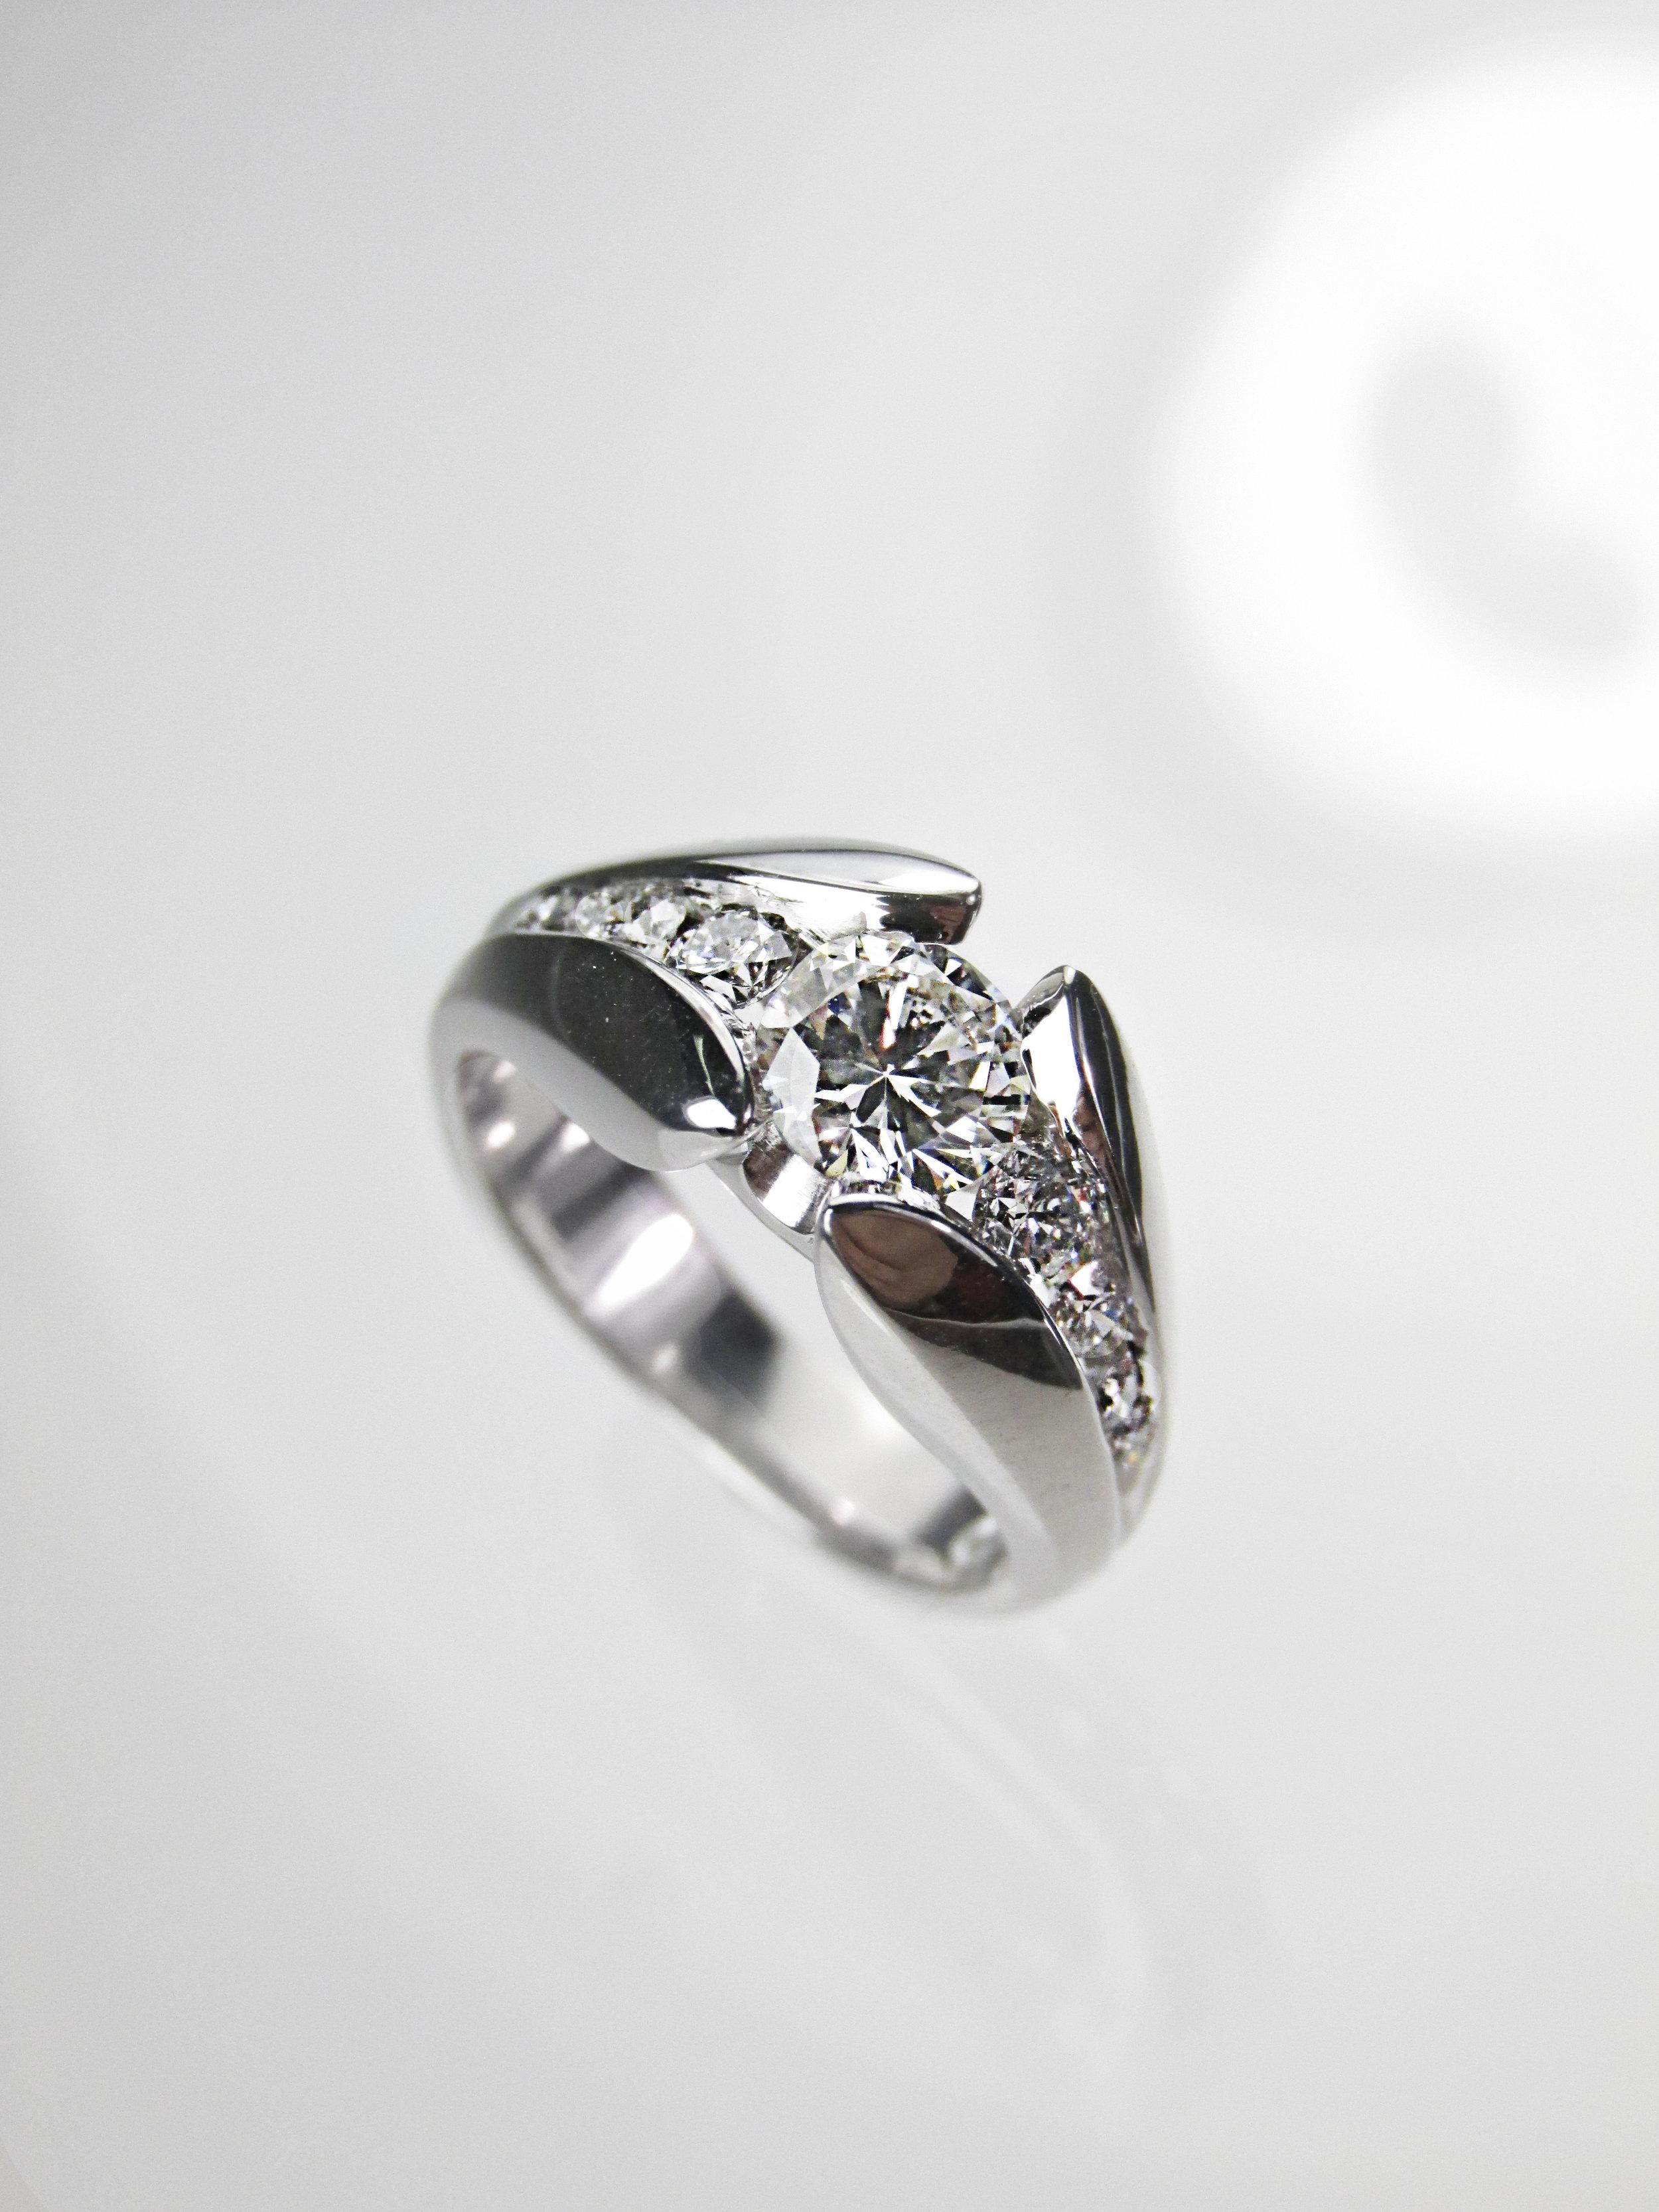 Taylor Signature Modern Engagement Ring